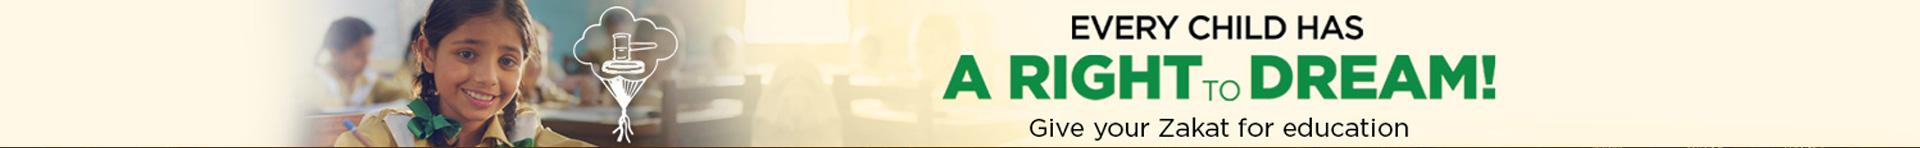 ramadan-campaign-2019-donationpage